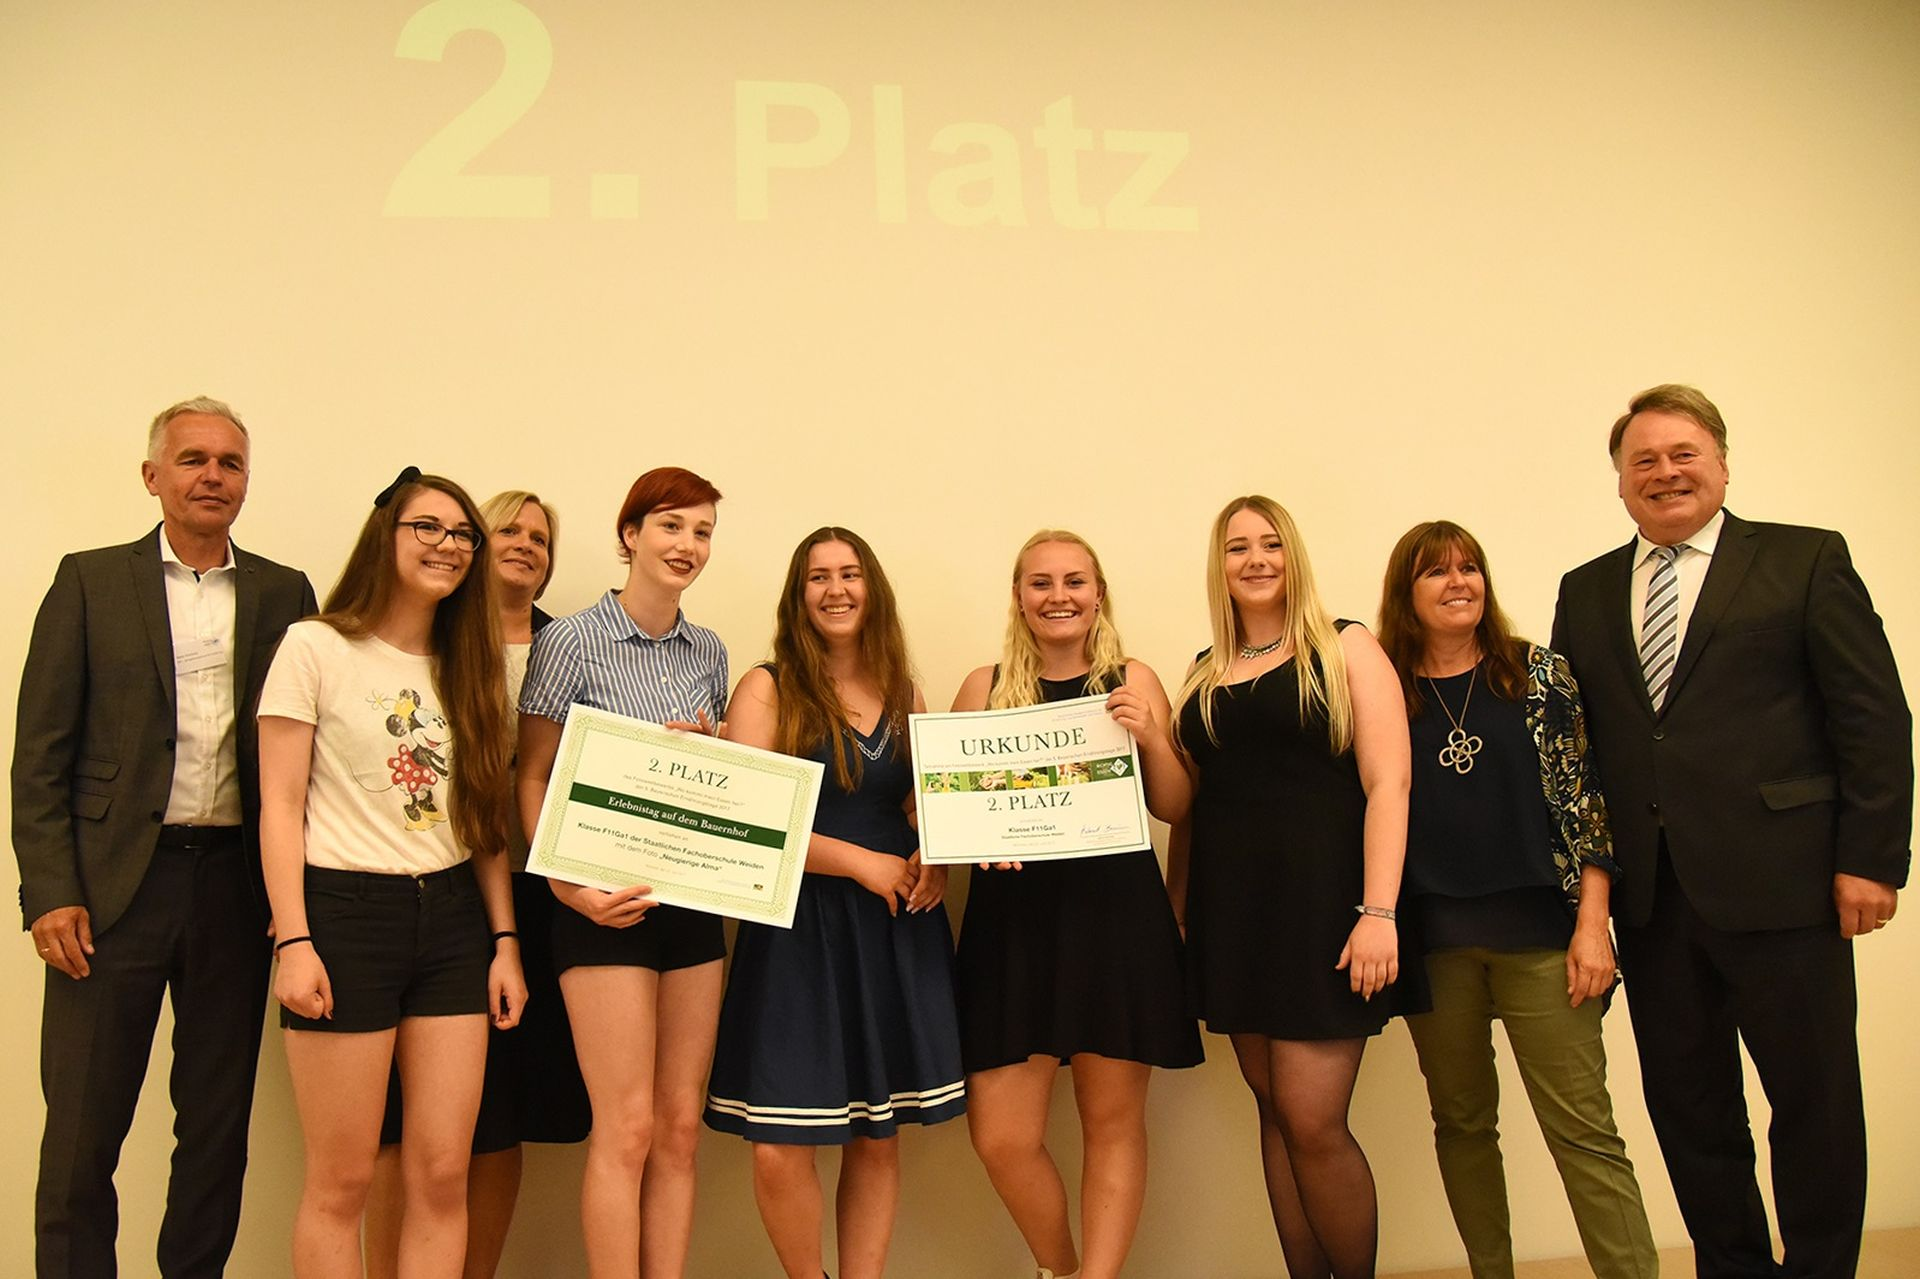 2017 06 26 Fotowettbewerb Tierisch Gut Content Staatsminister Gruppe